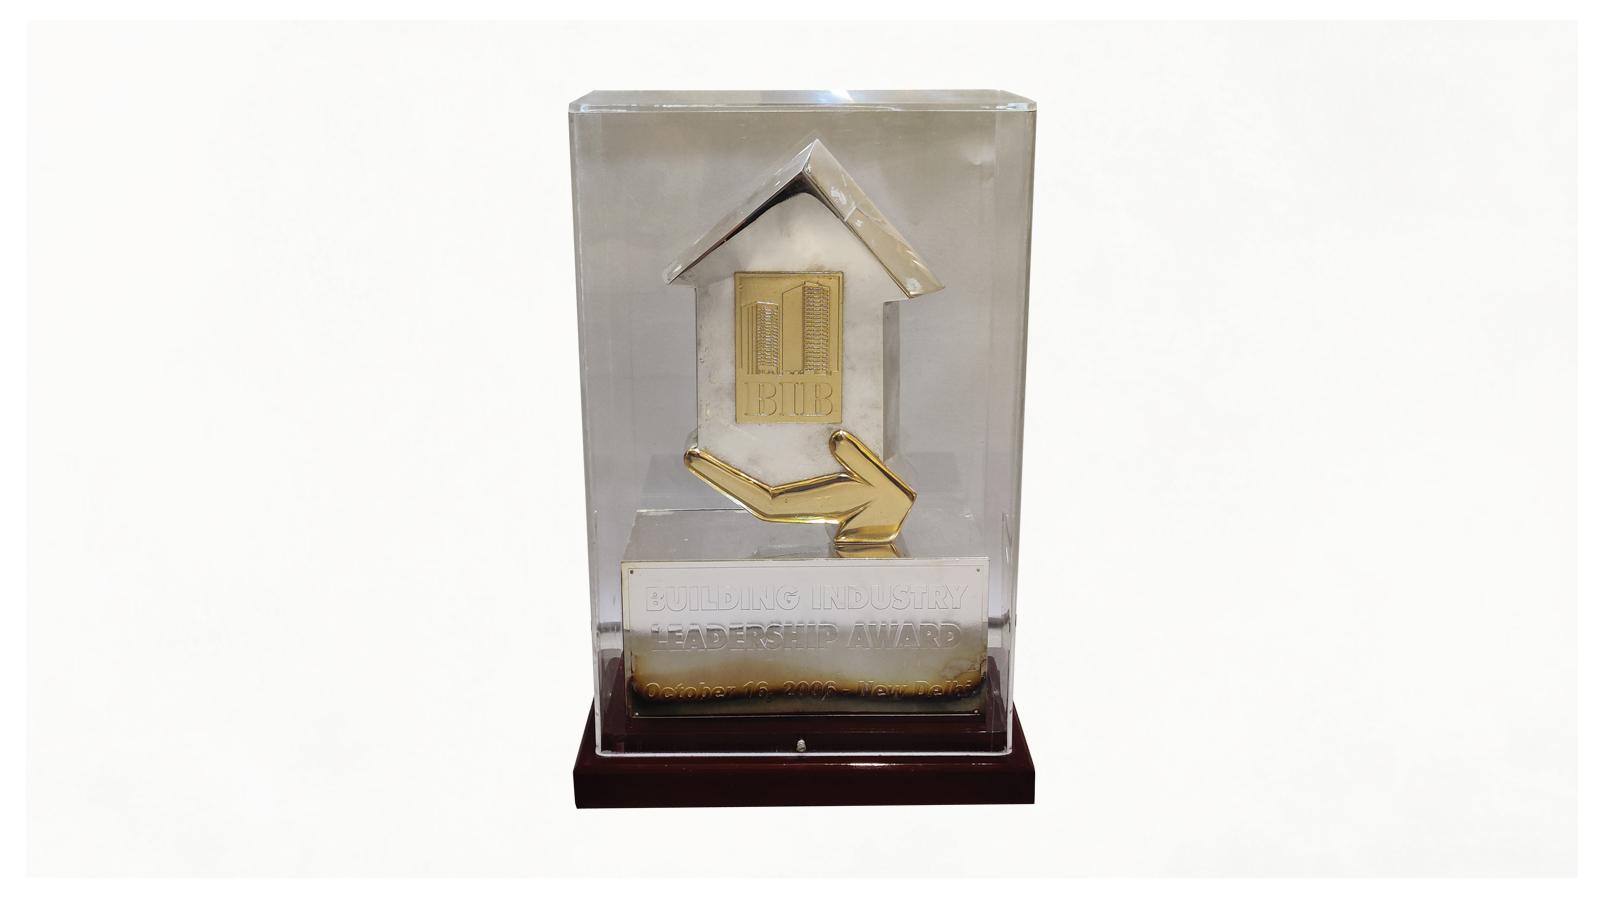 Building Industry Leadership Award 2006